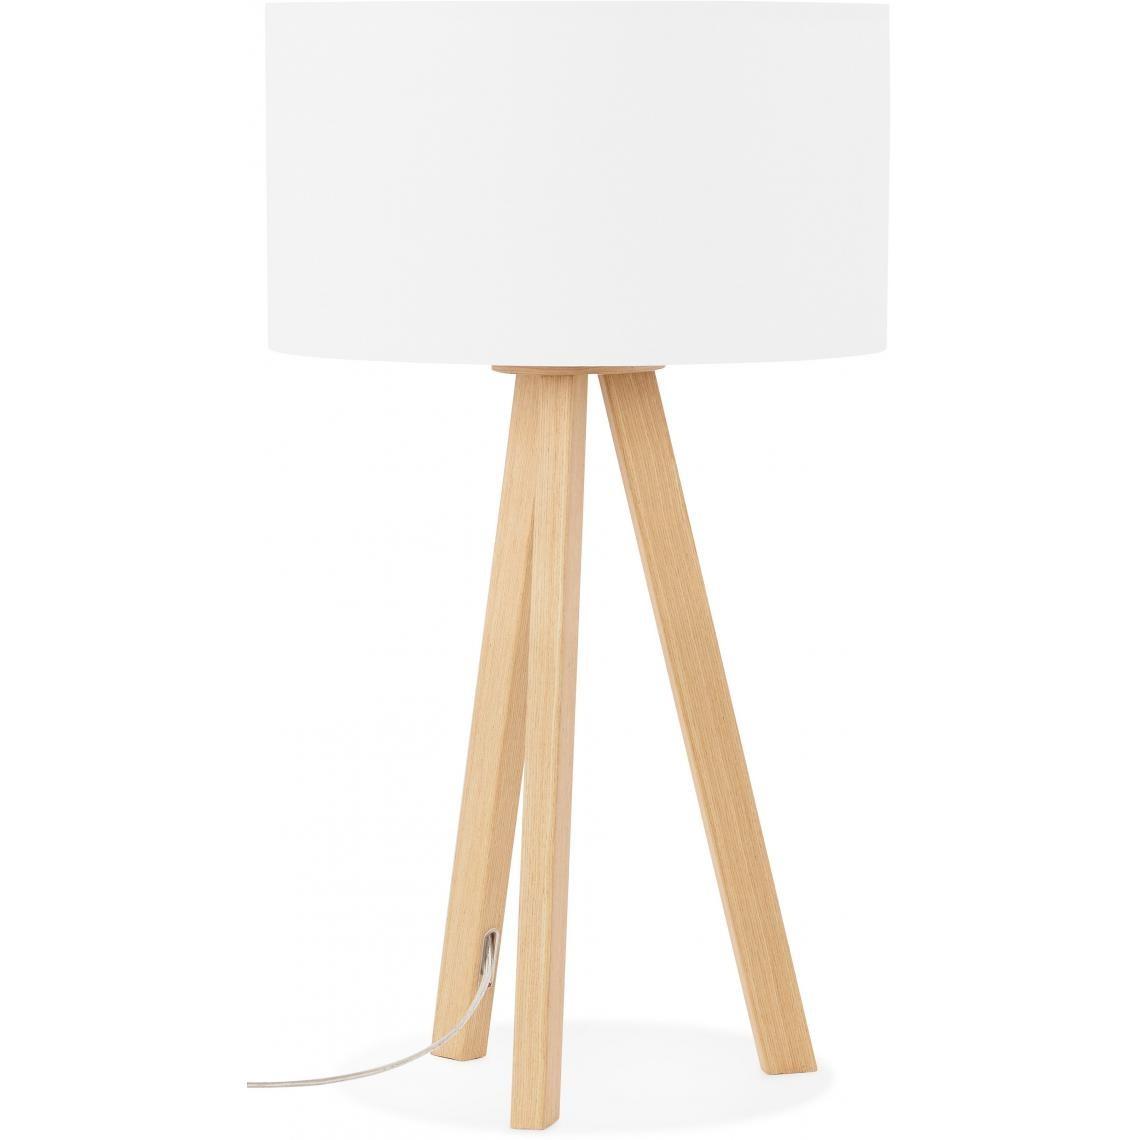 Lampe Scandinave Abat Jour Blanc TORNBY | 3 SUISSES